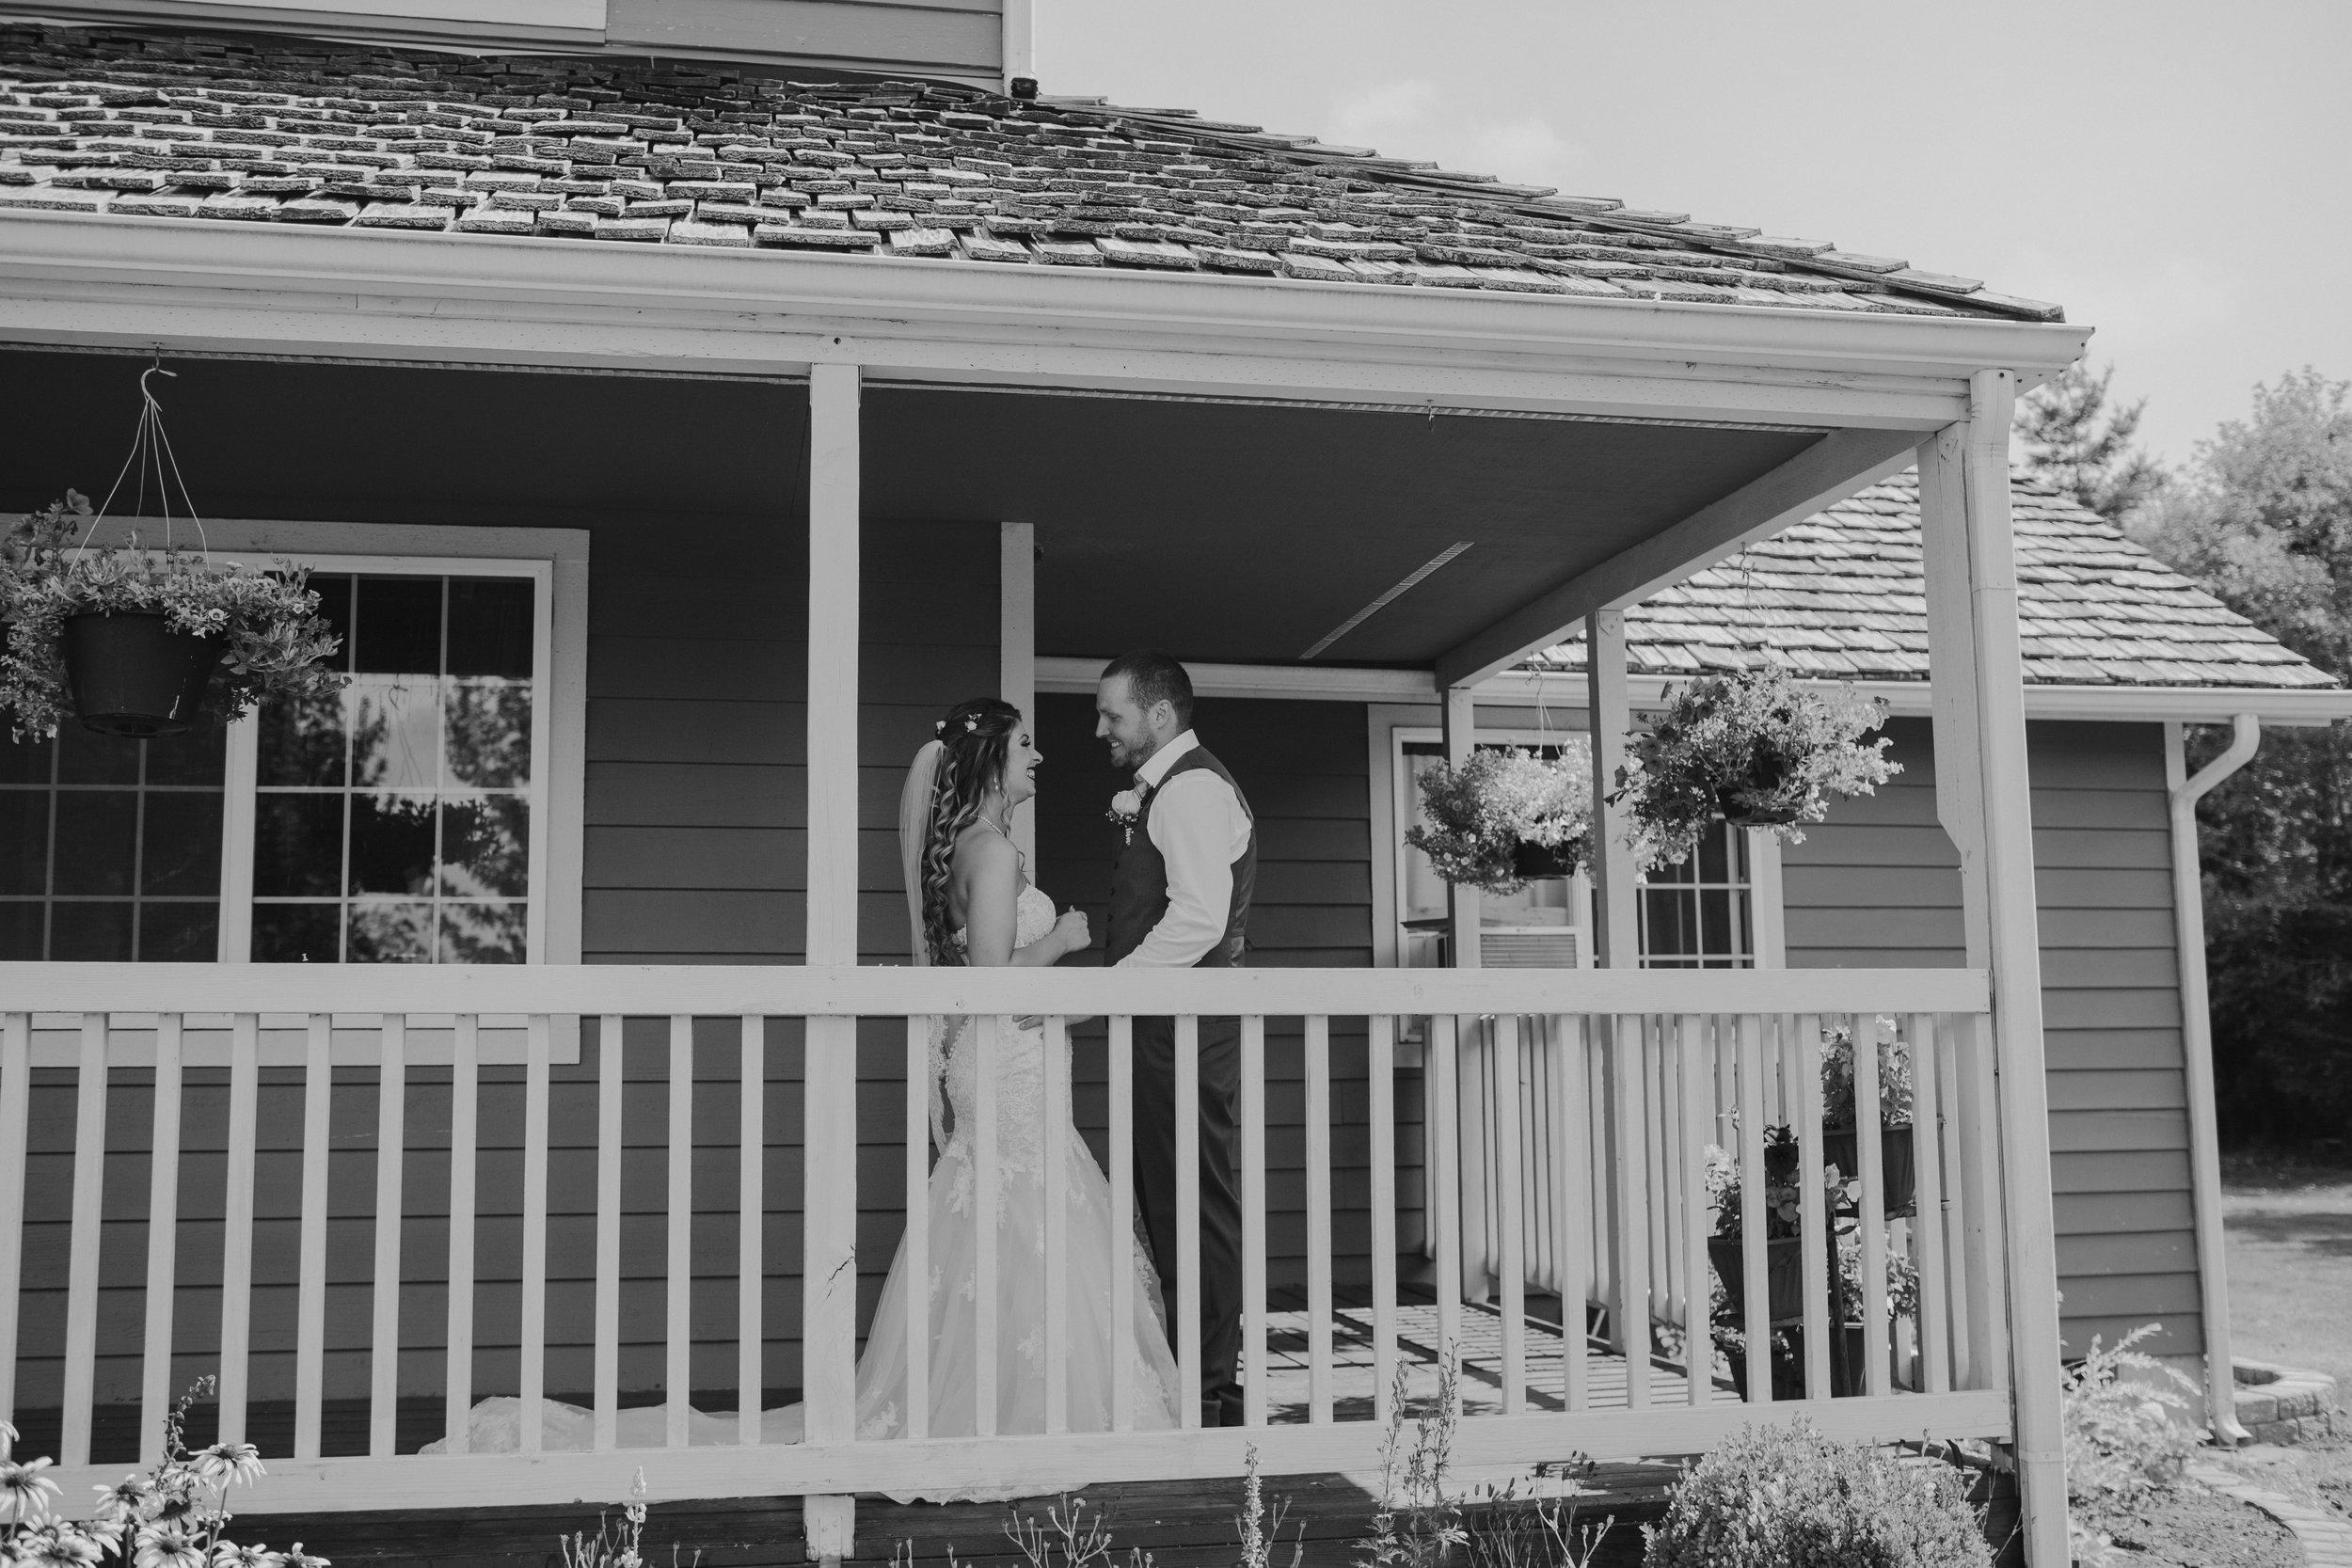 Olympic-Peninsula-Wedding-Photographer-PNW-Forks-Port-Angeles-Kayla-Dawn-Photography-engagement-Olympic-National-Park-158.jpg